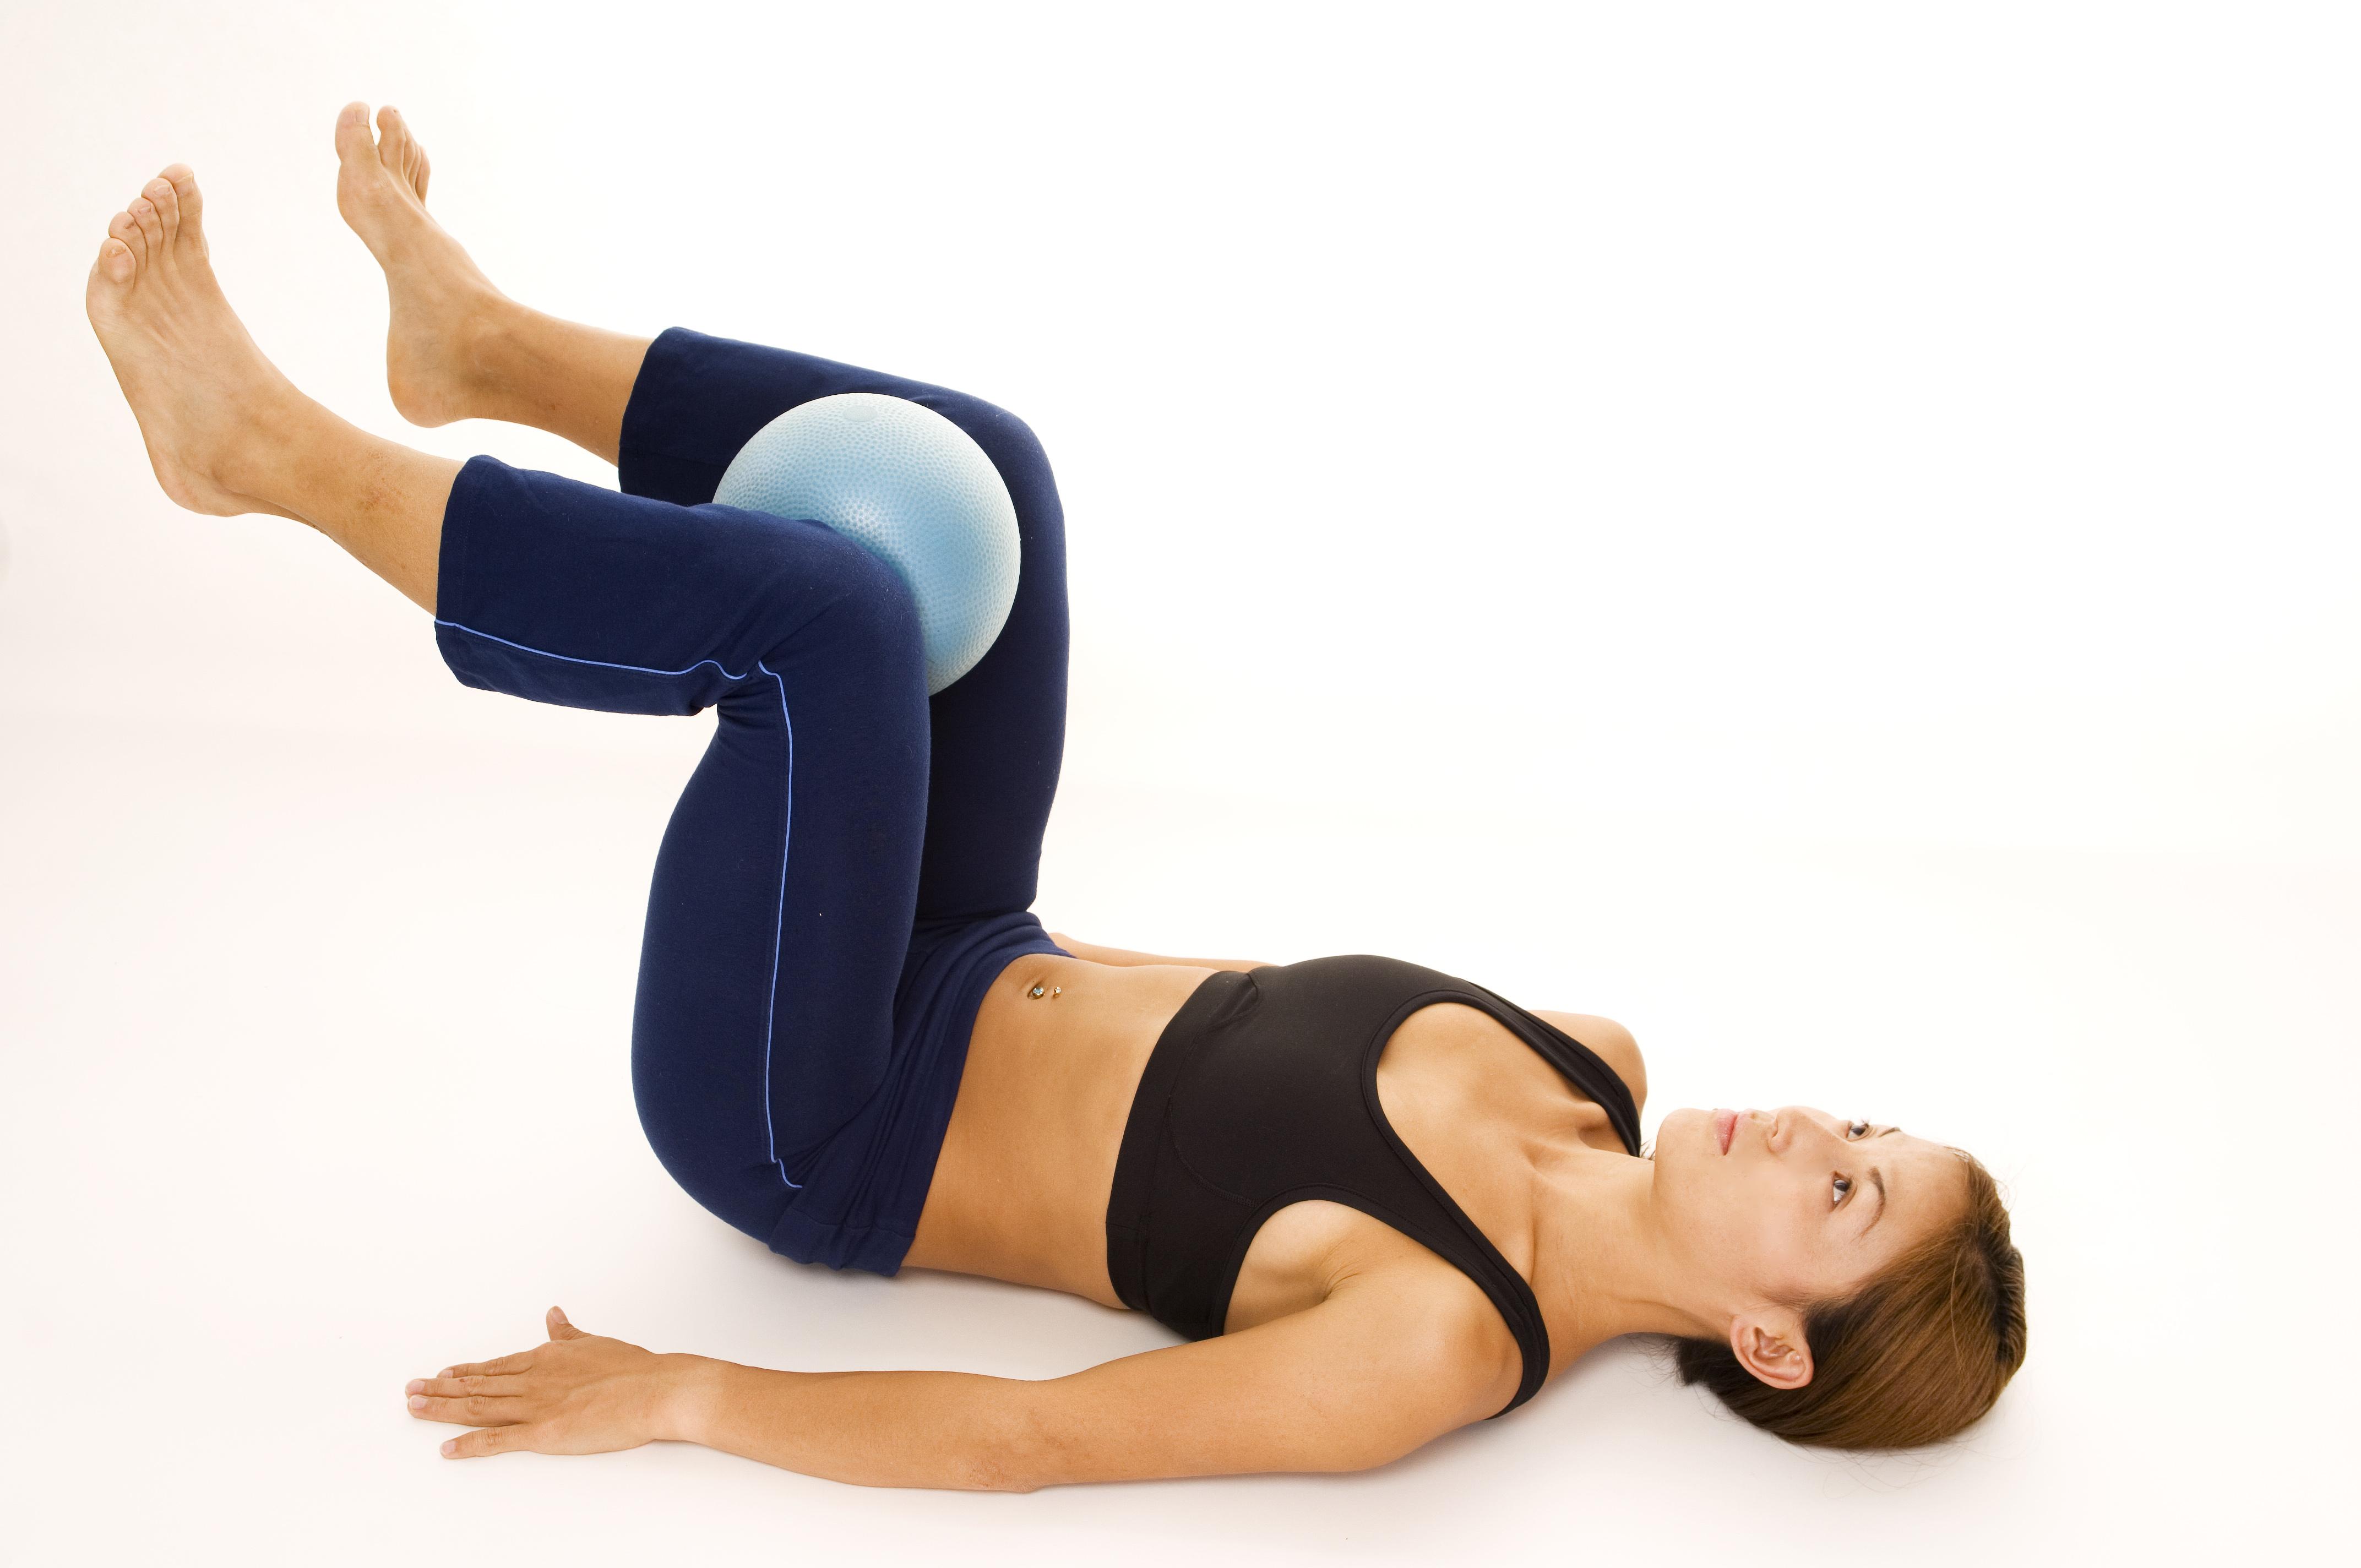 hip flexor pressure vs. Hernia